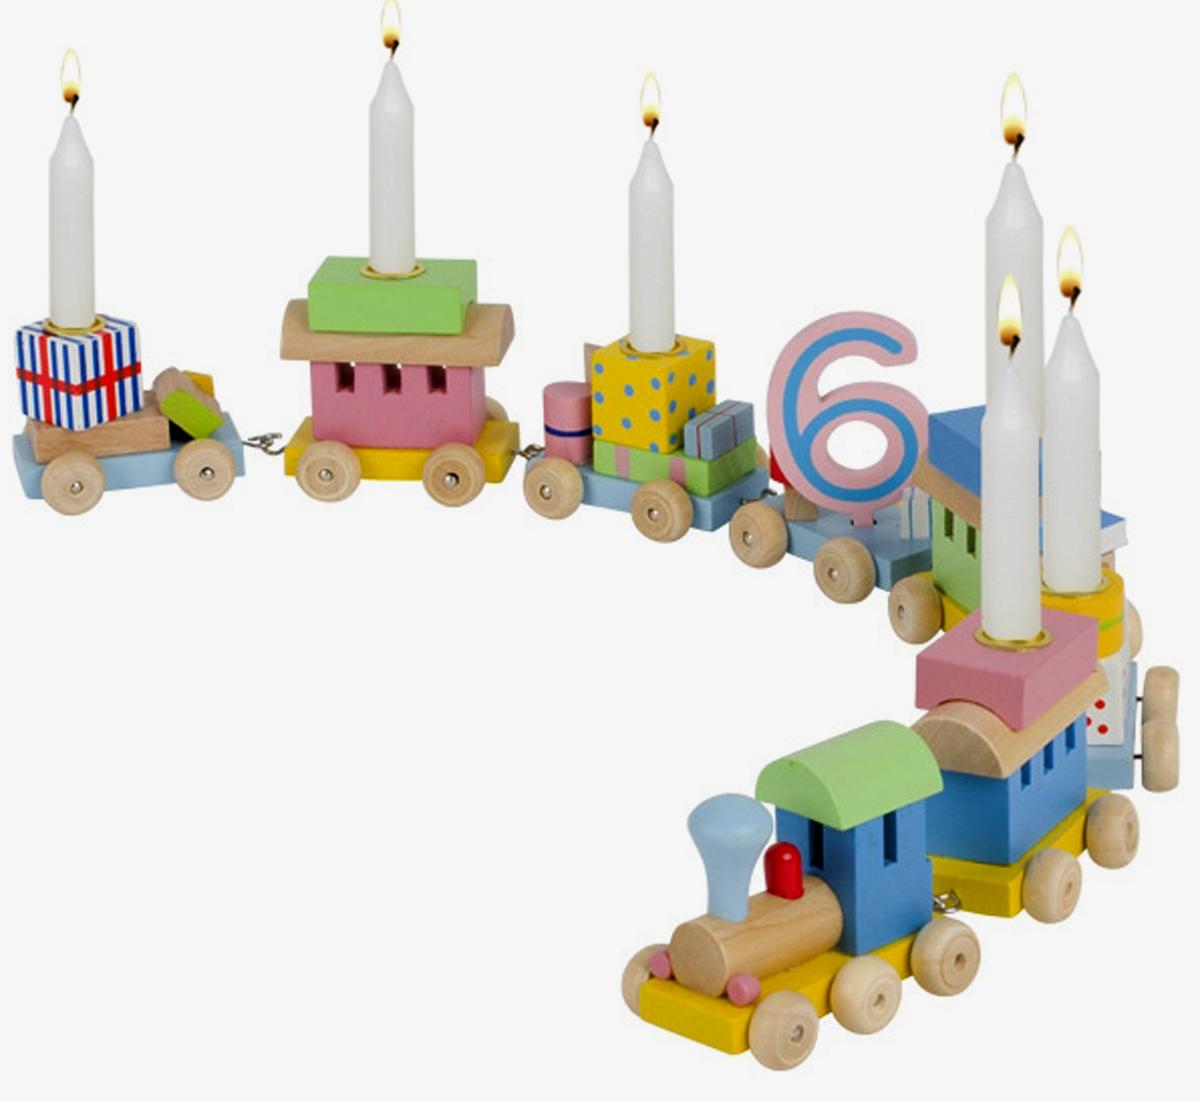 Geburtstagszug farbig mehrteilig